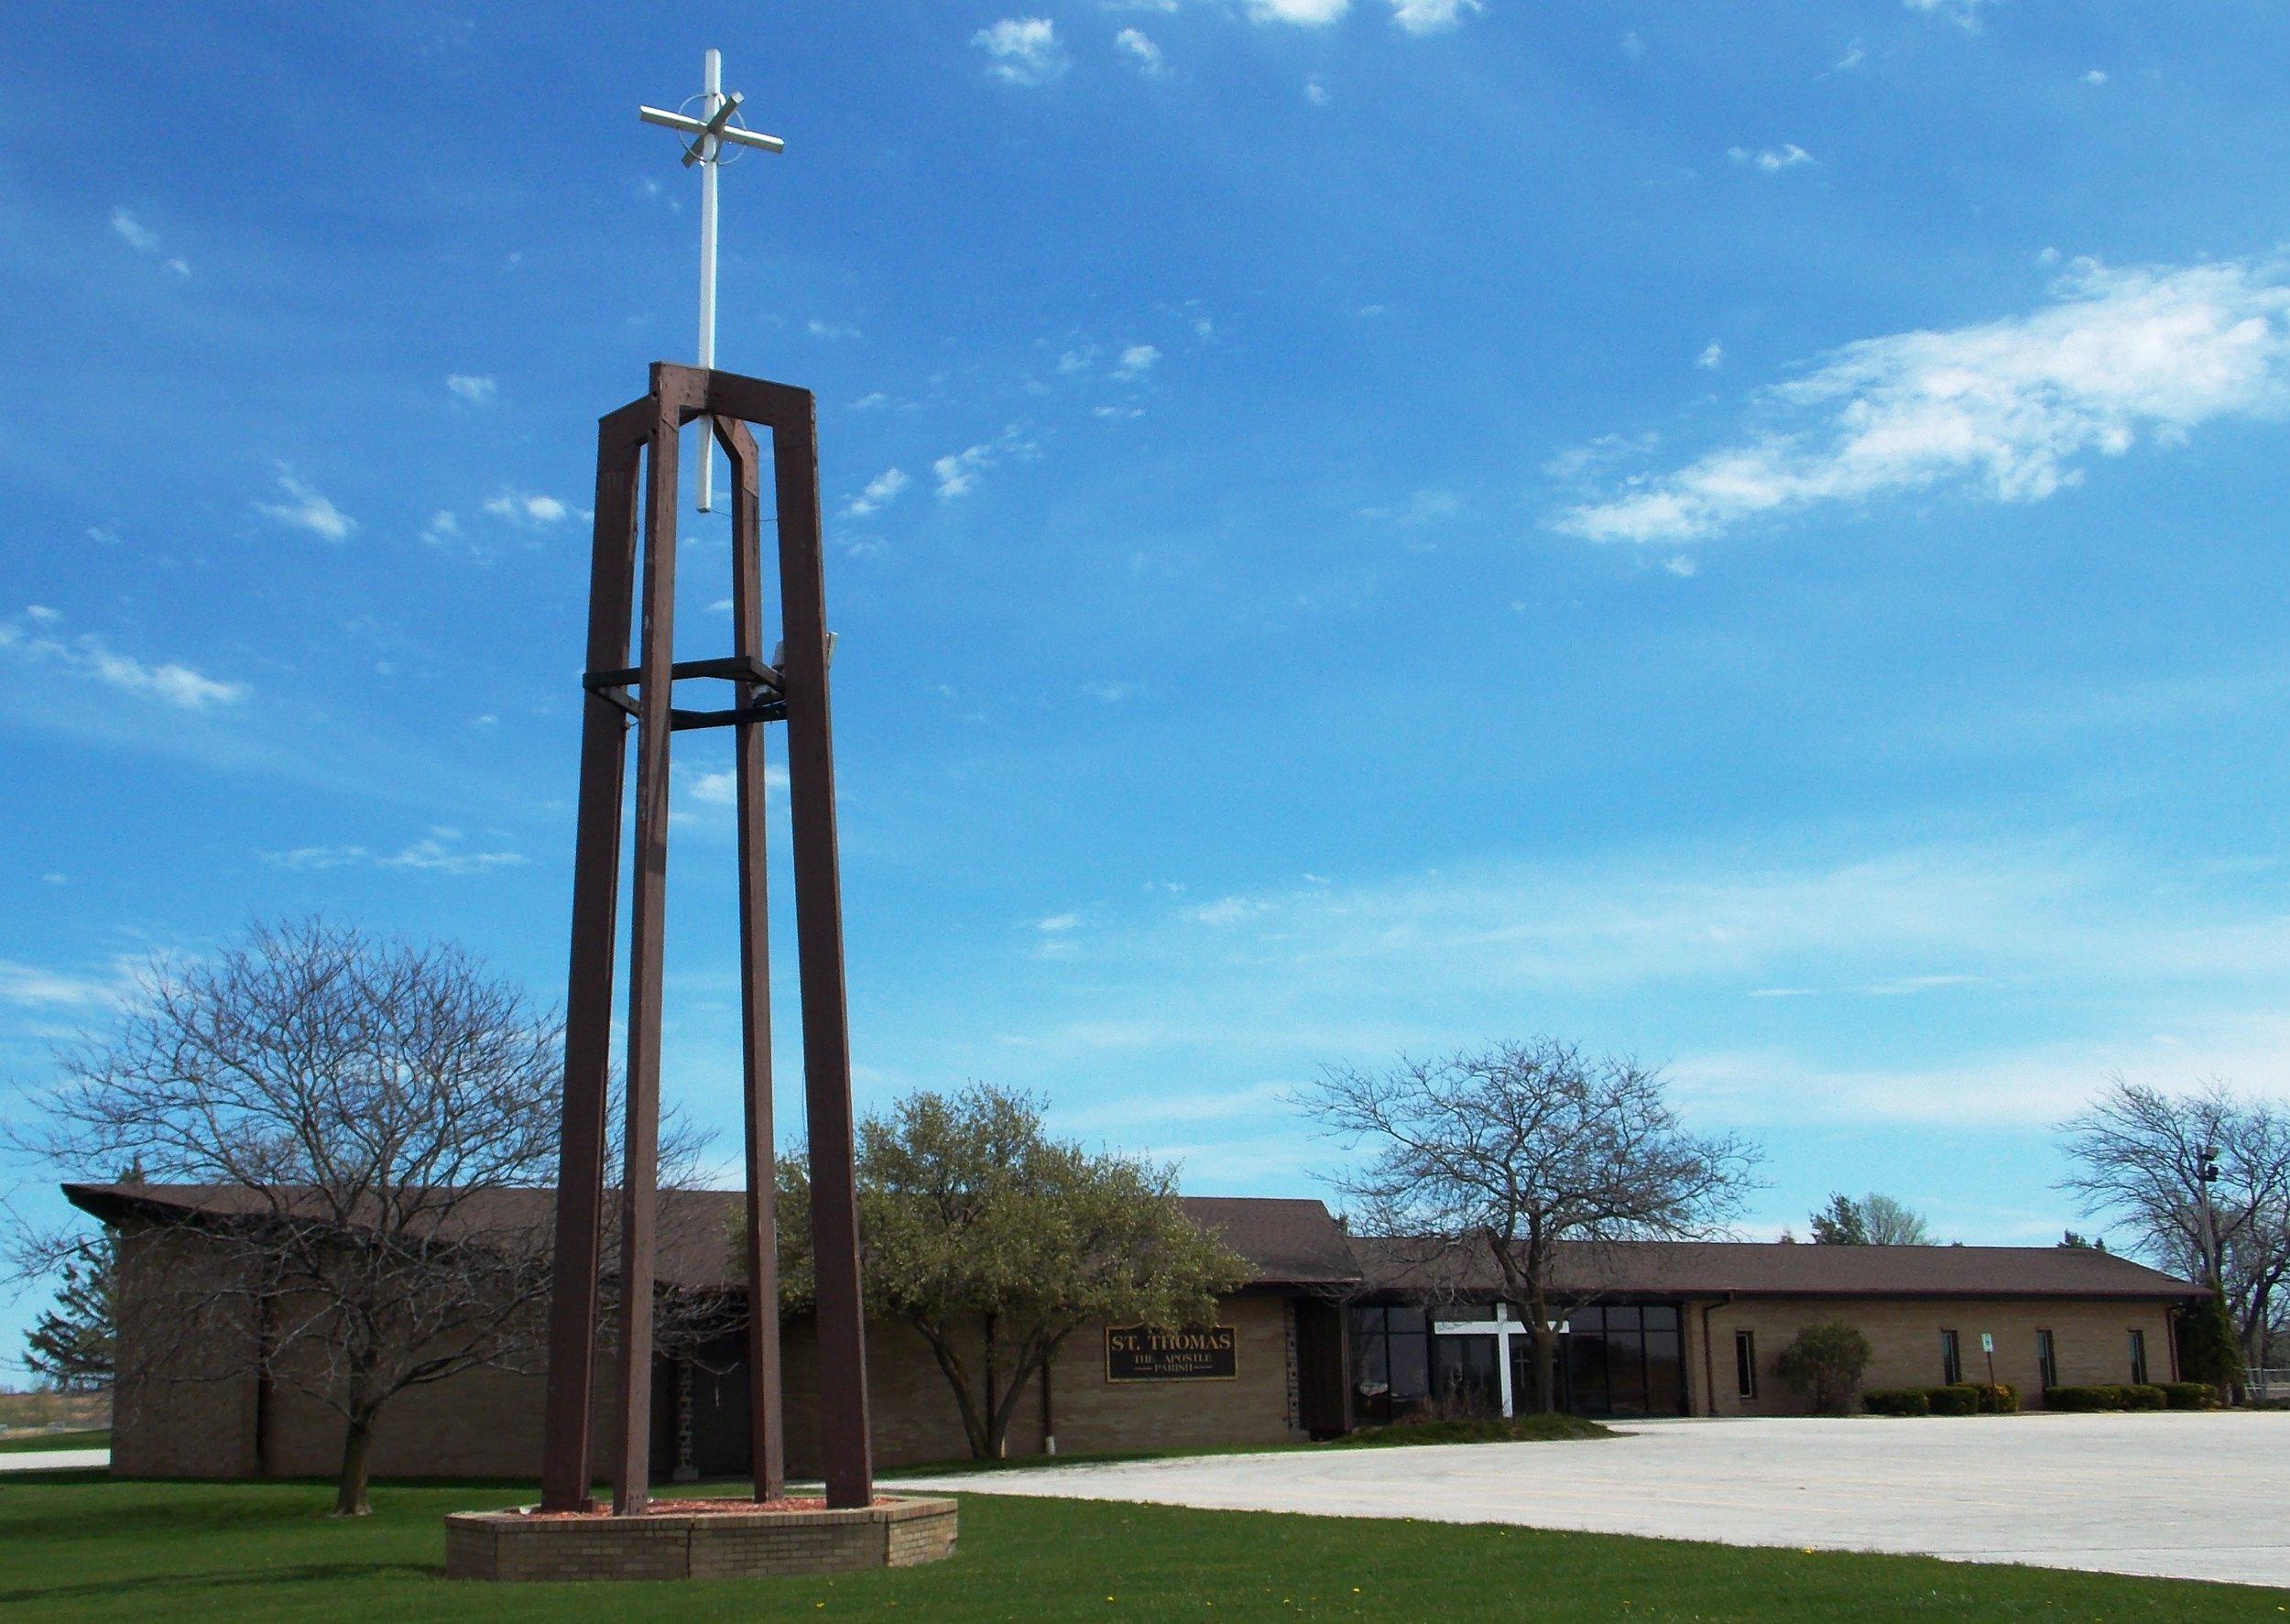 St. Thomas mission.jpg